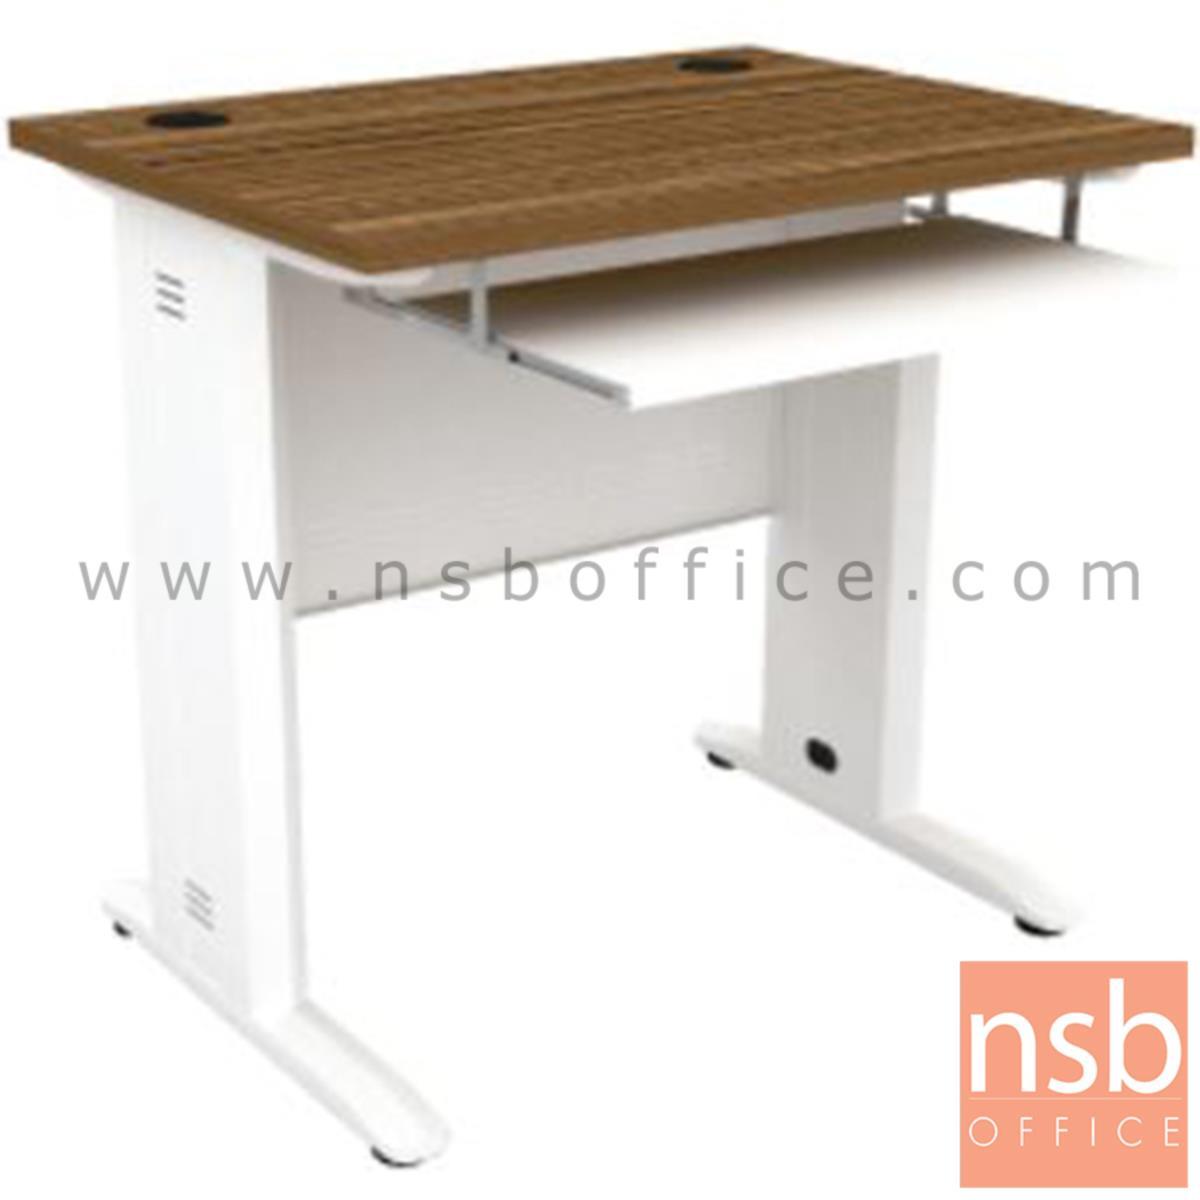 A34A007:โต๊ะคอมพิวเตอร์  รุ่น Royal (โรยัล) ขนาด 80W cm. สีซีบราโน่-ขาว